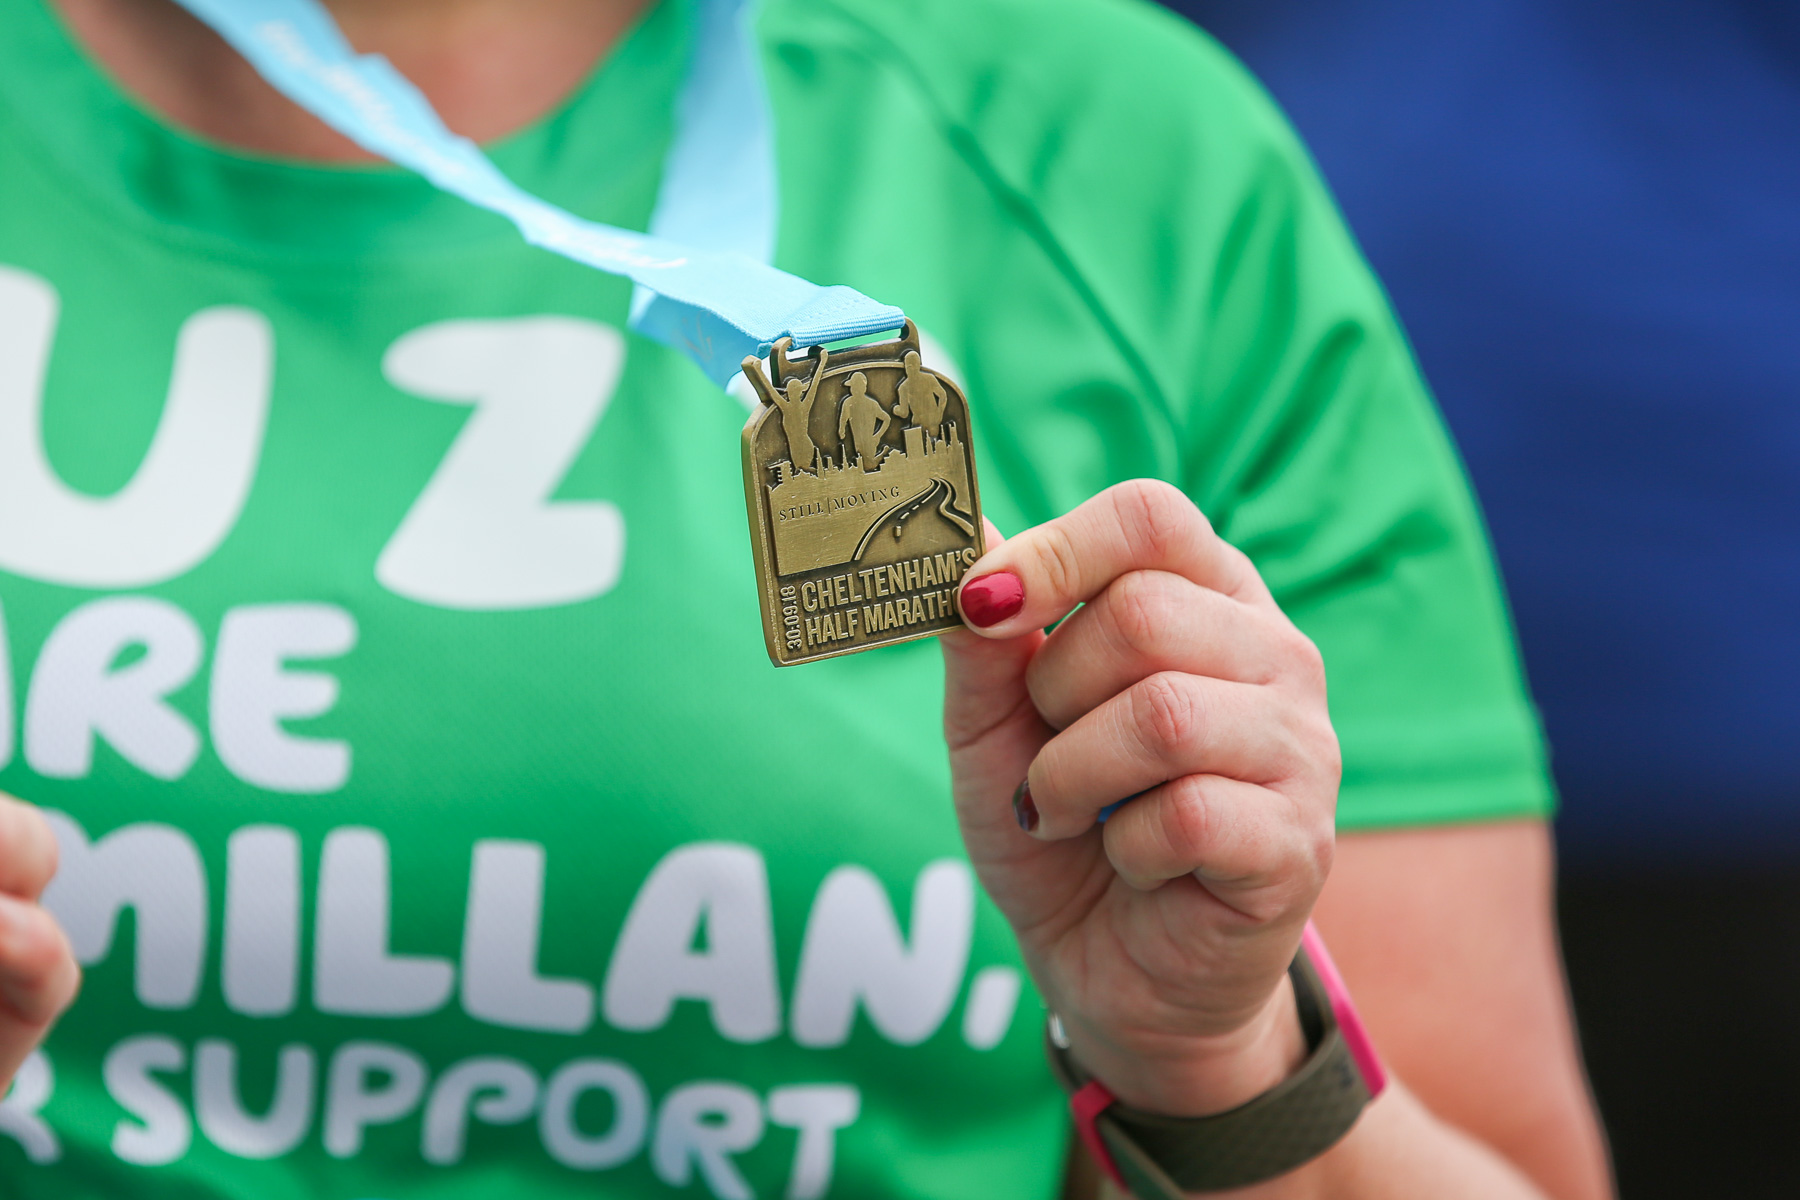 Macmillan-charity-marathon-run-cheltenham-racecourse-september-2018-natalia-smith-photography0346.jpg